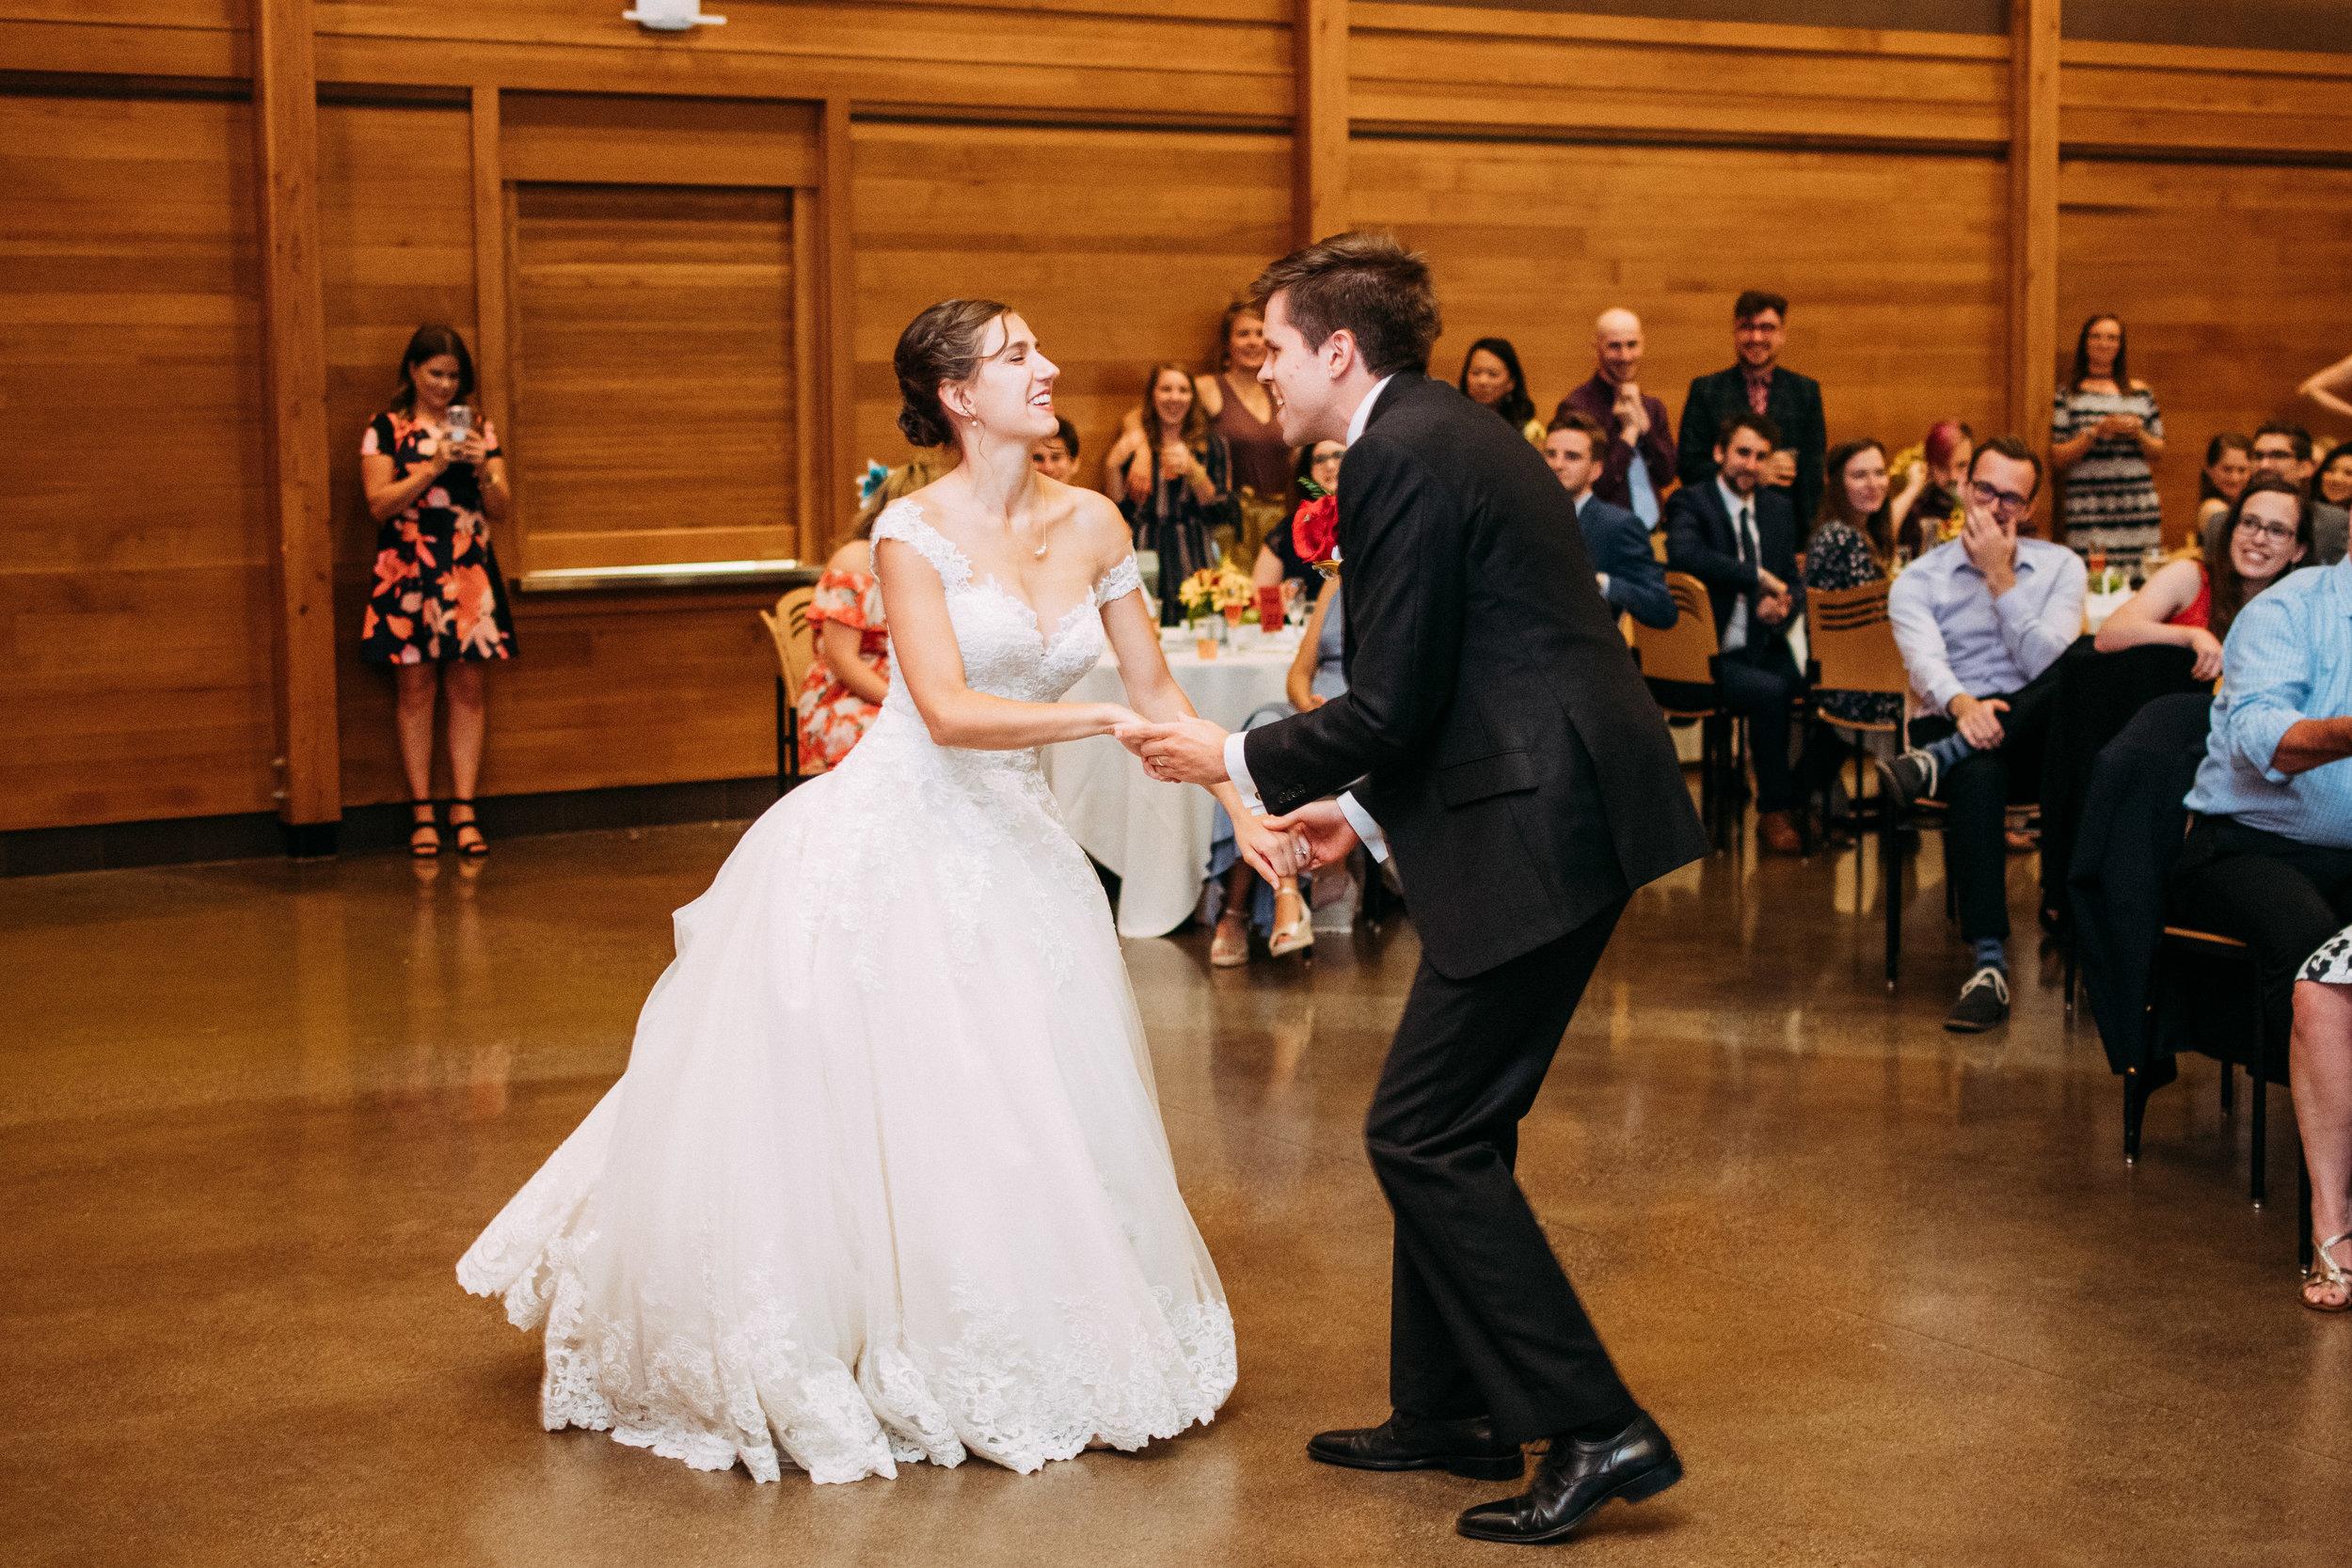 41-Liza_Chris_Minneapolis_Minnesota_Wedding.jpg